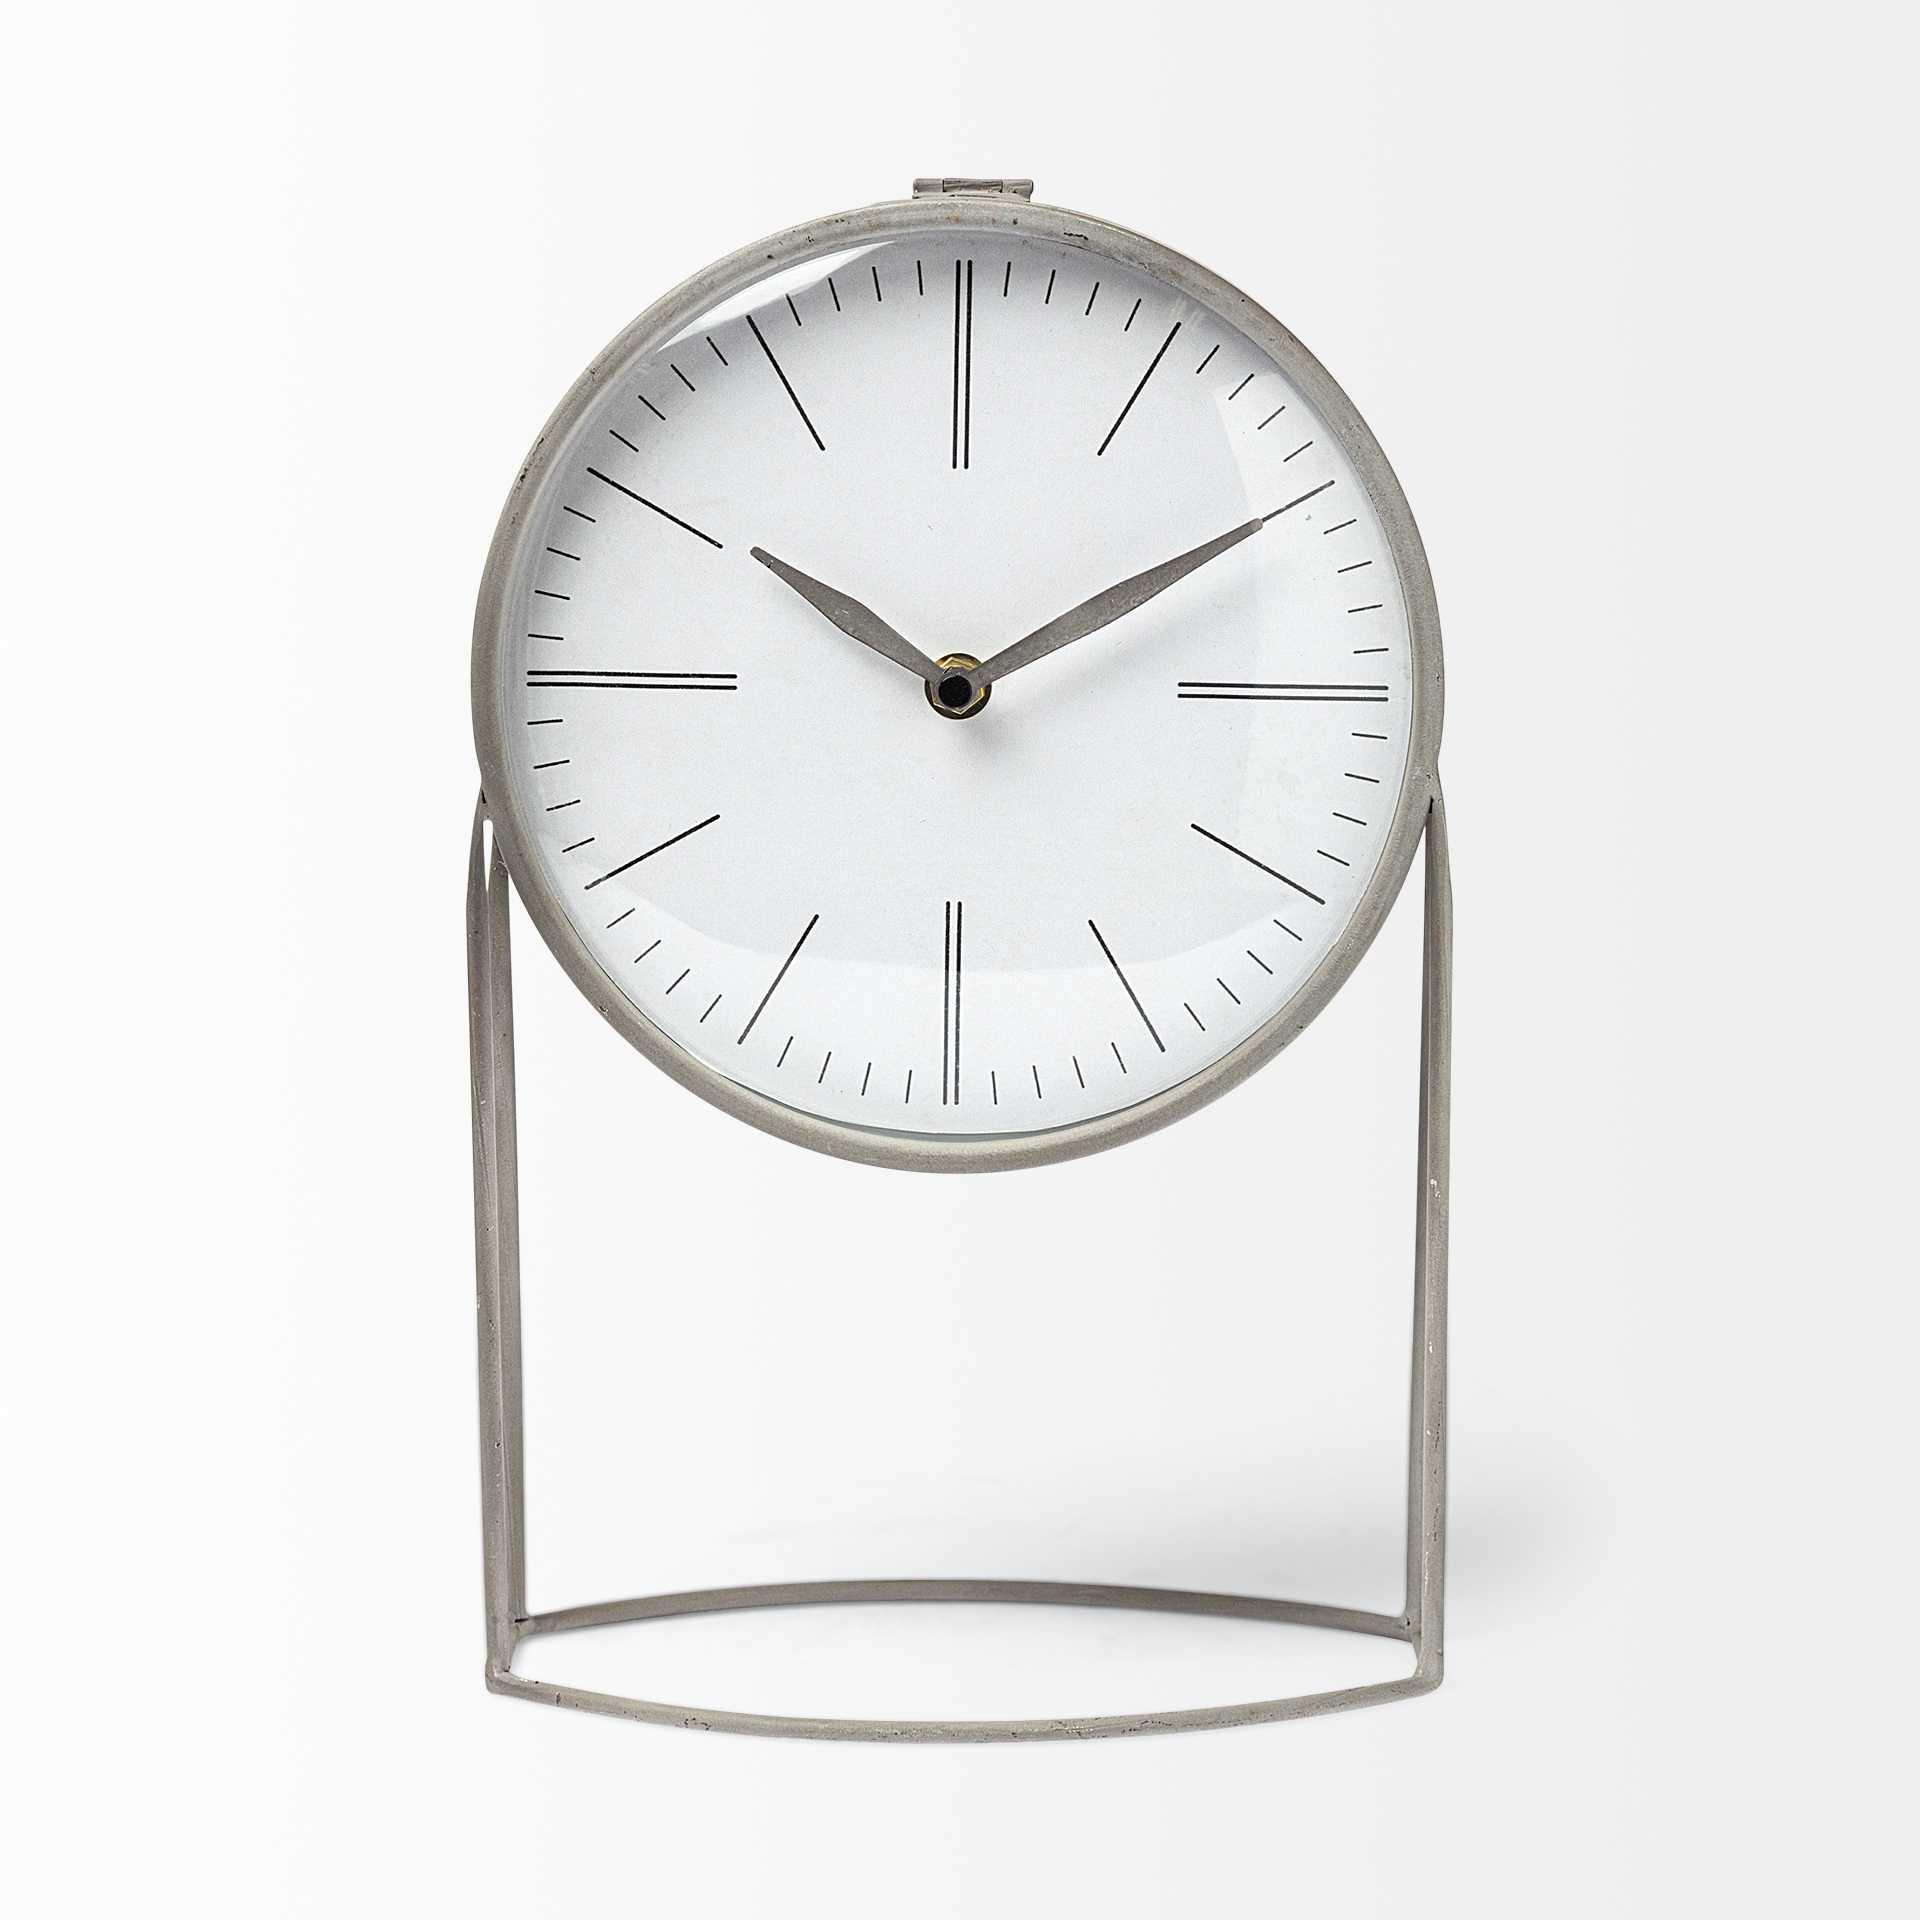 Gray Metal Circular Desk / Table Clock Equipped with a Quartz Movement